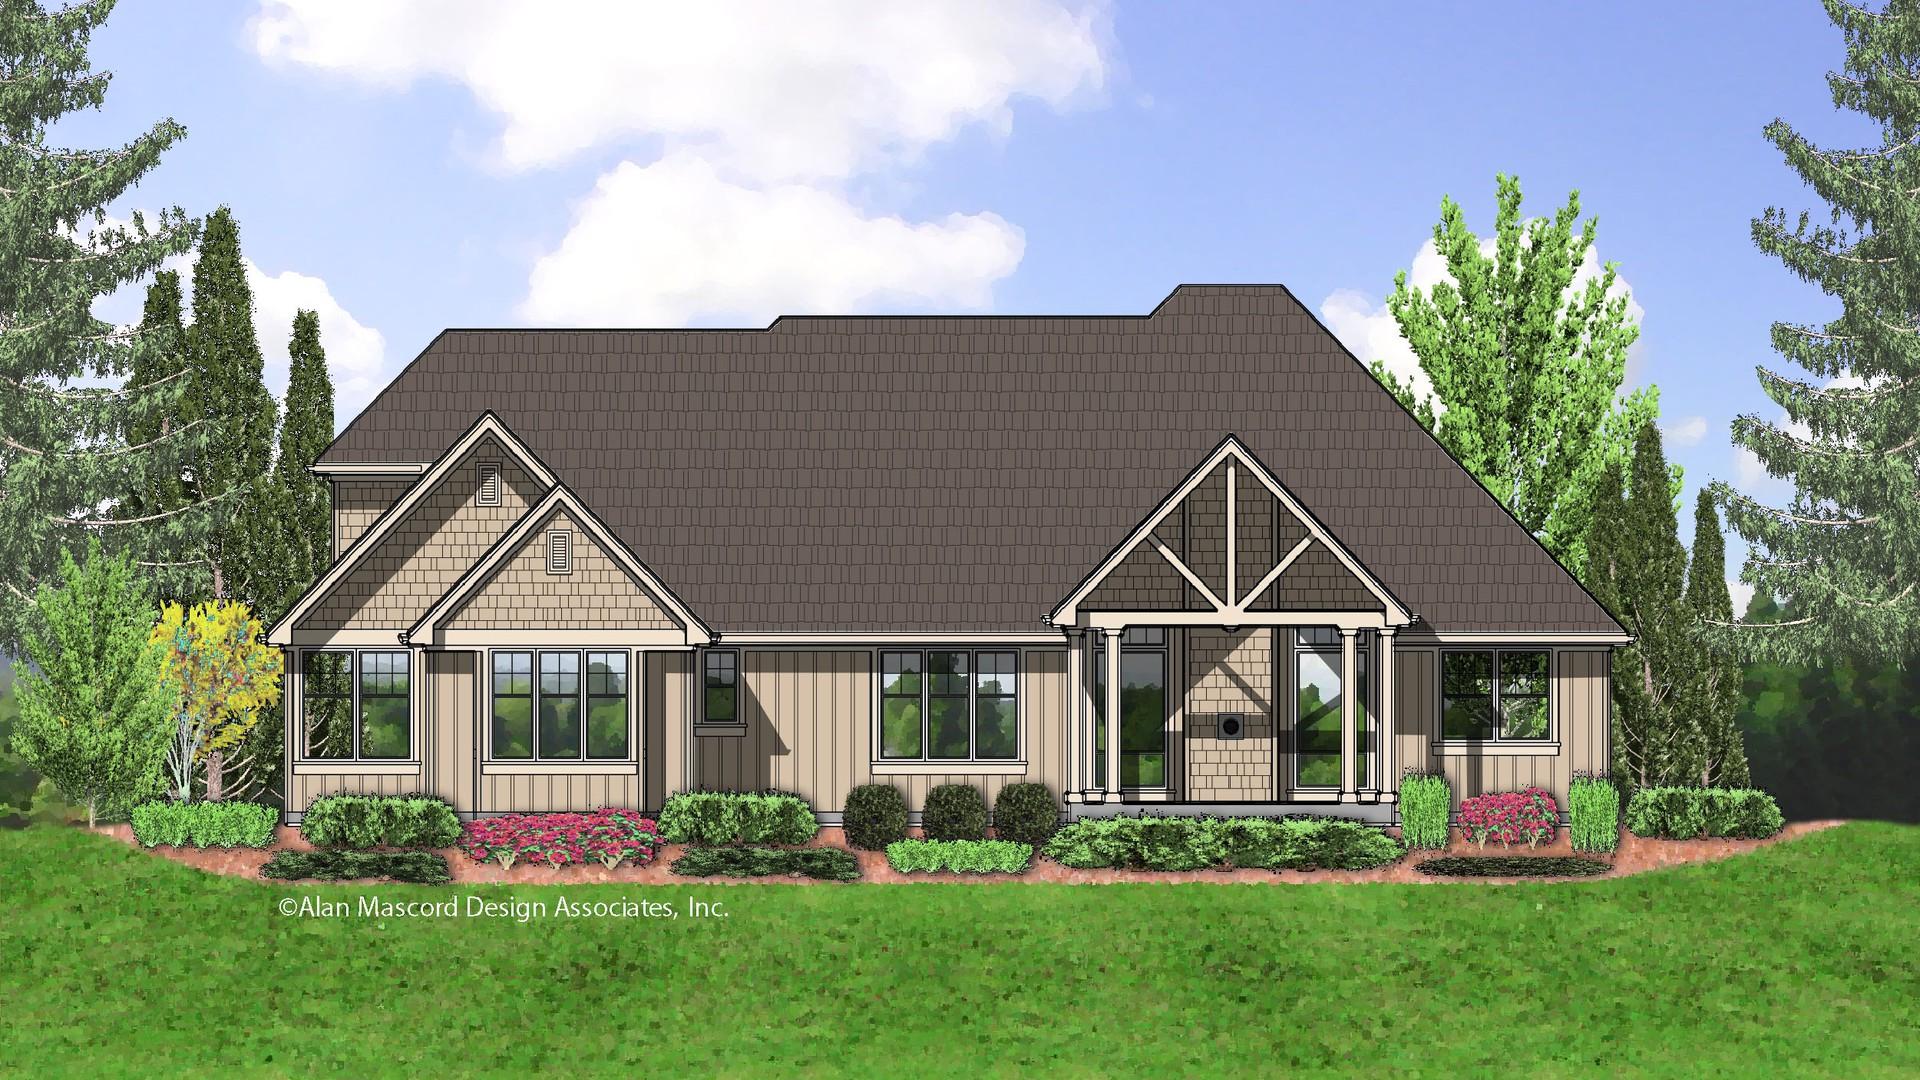 Traditional house plan b22158a the jasper 2359 sqft 3 for Jasper house